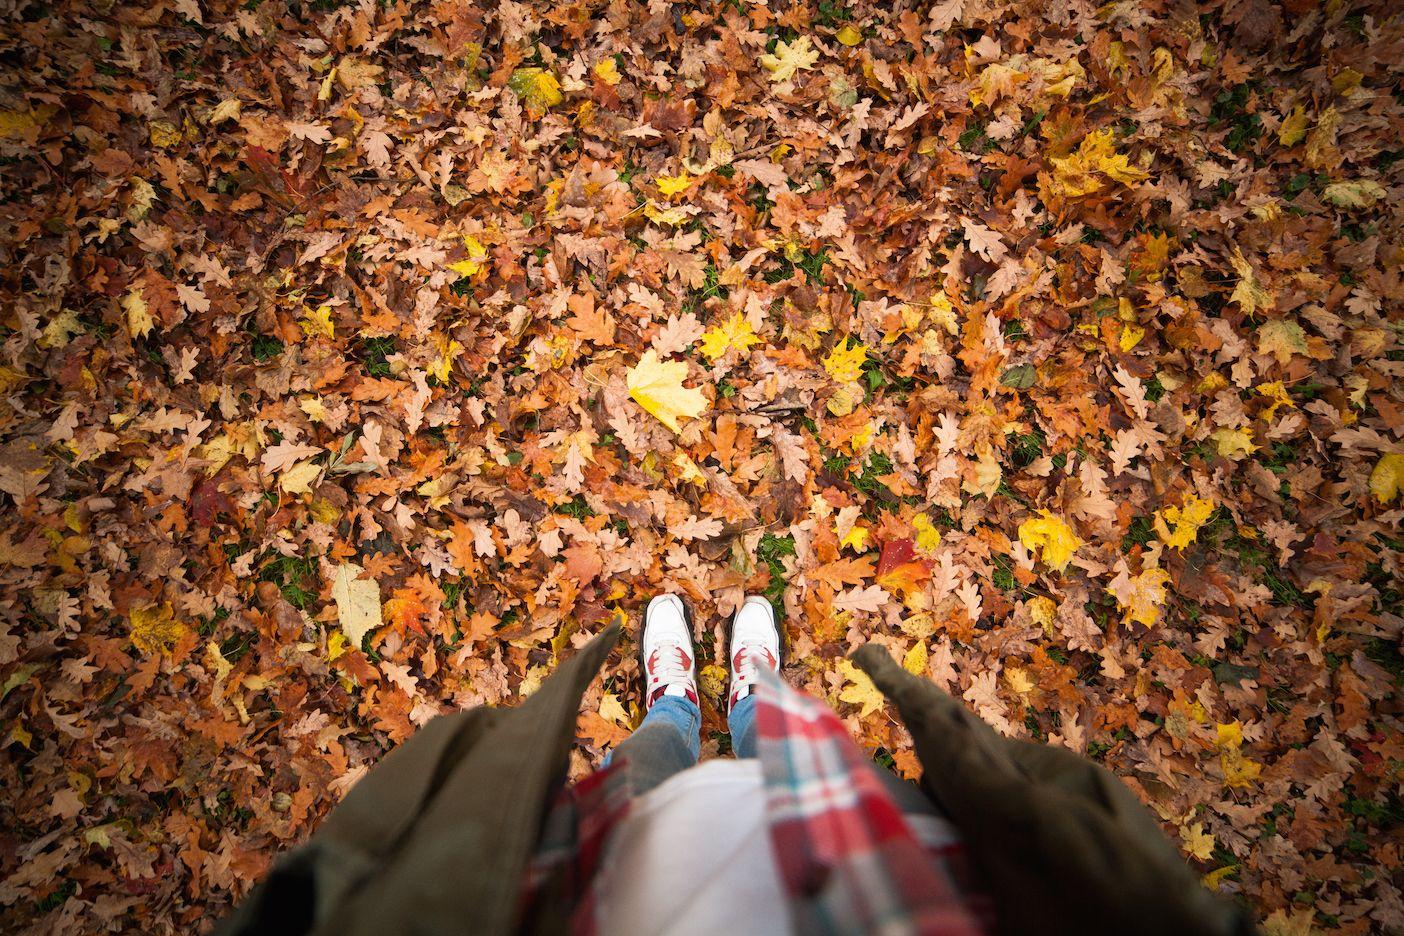 October Half Term Fun 29th October - 2nd November